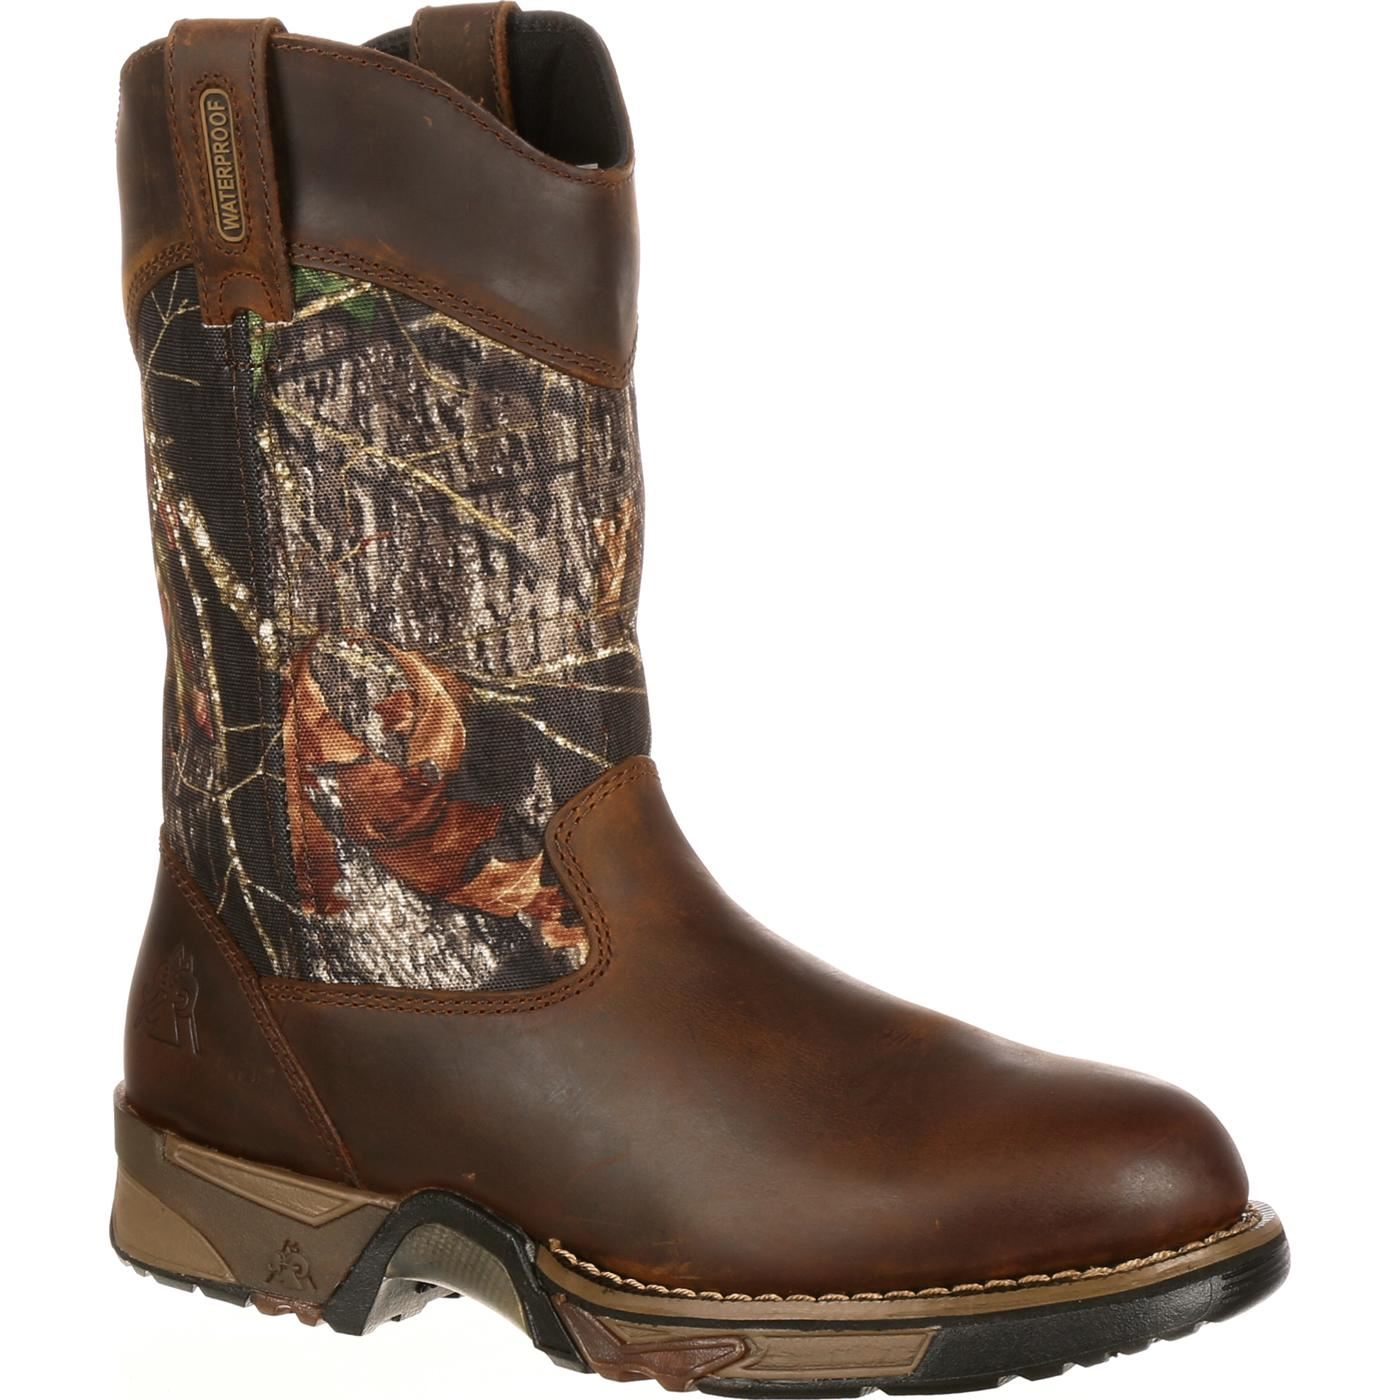 rocky s aztec waterproof camo pull on boots ebay